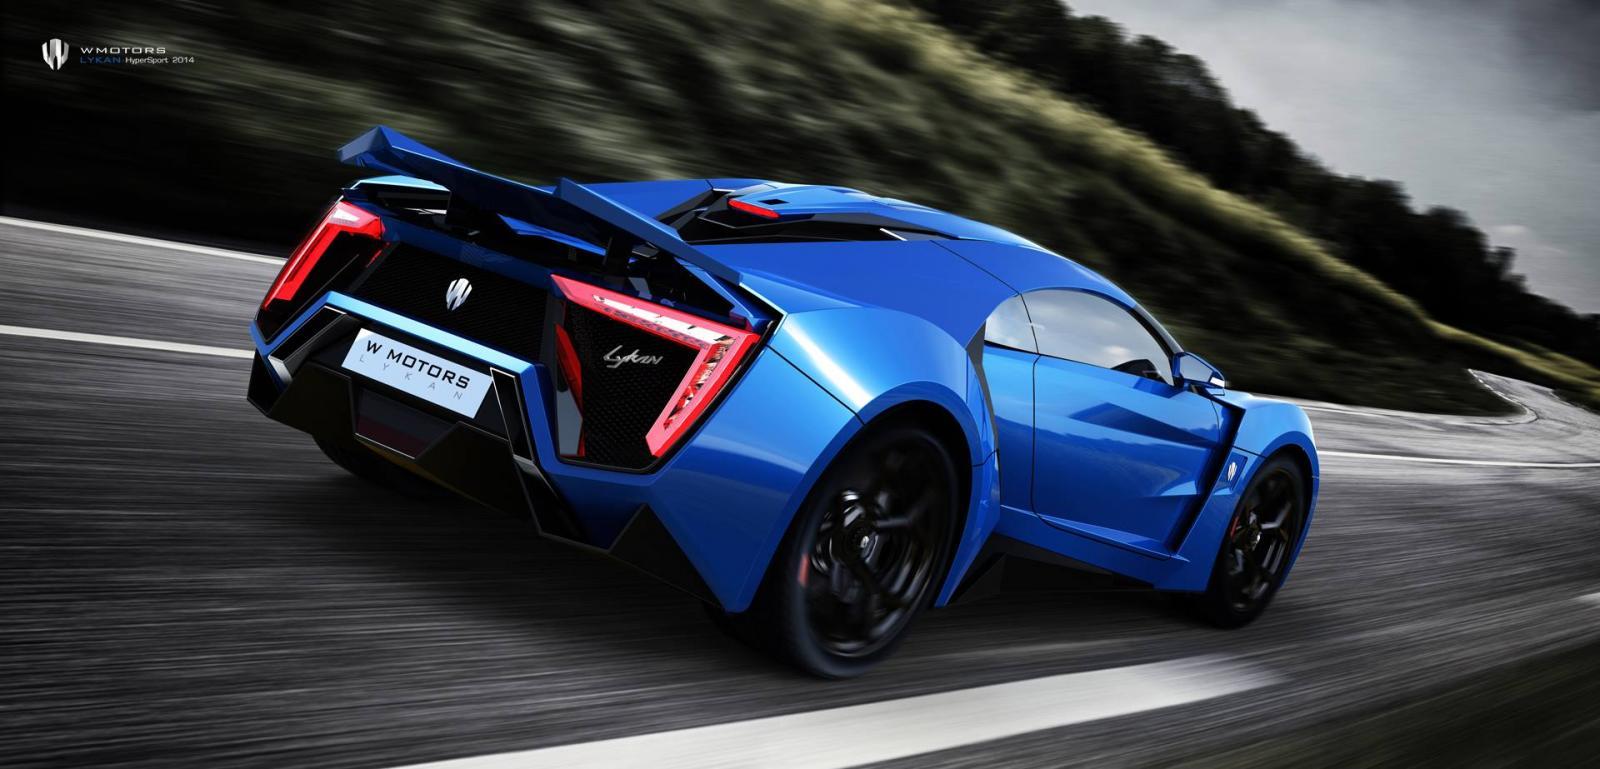 W Motors Cars News 3 4m Lykan Hypersport Arab Supercar